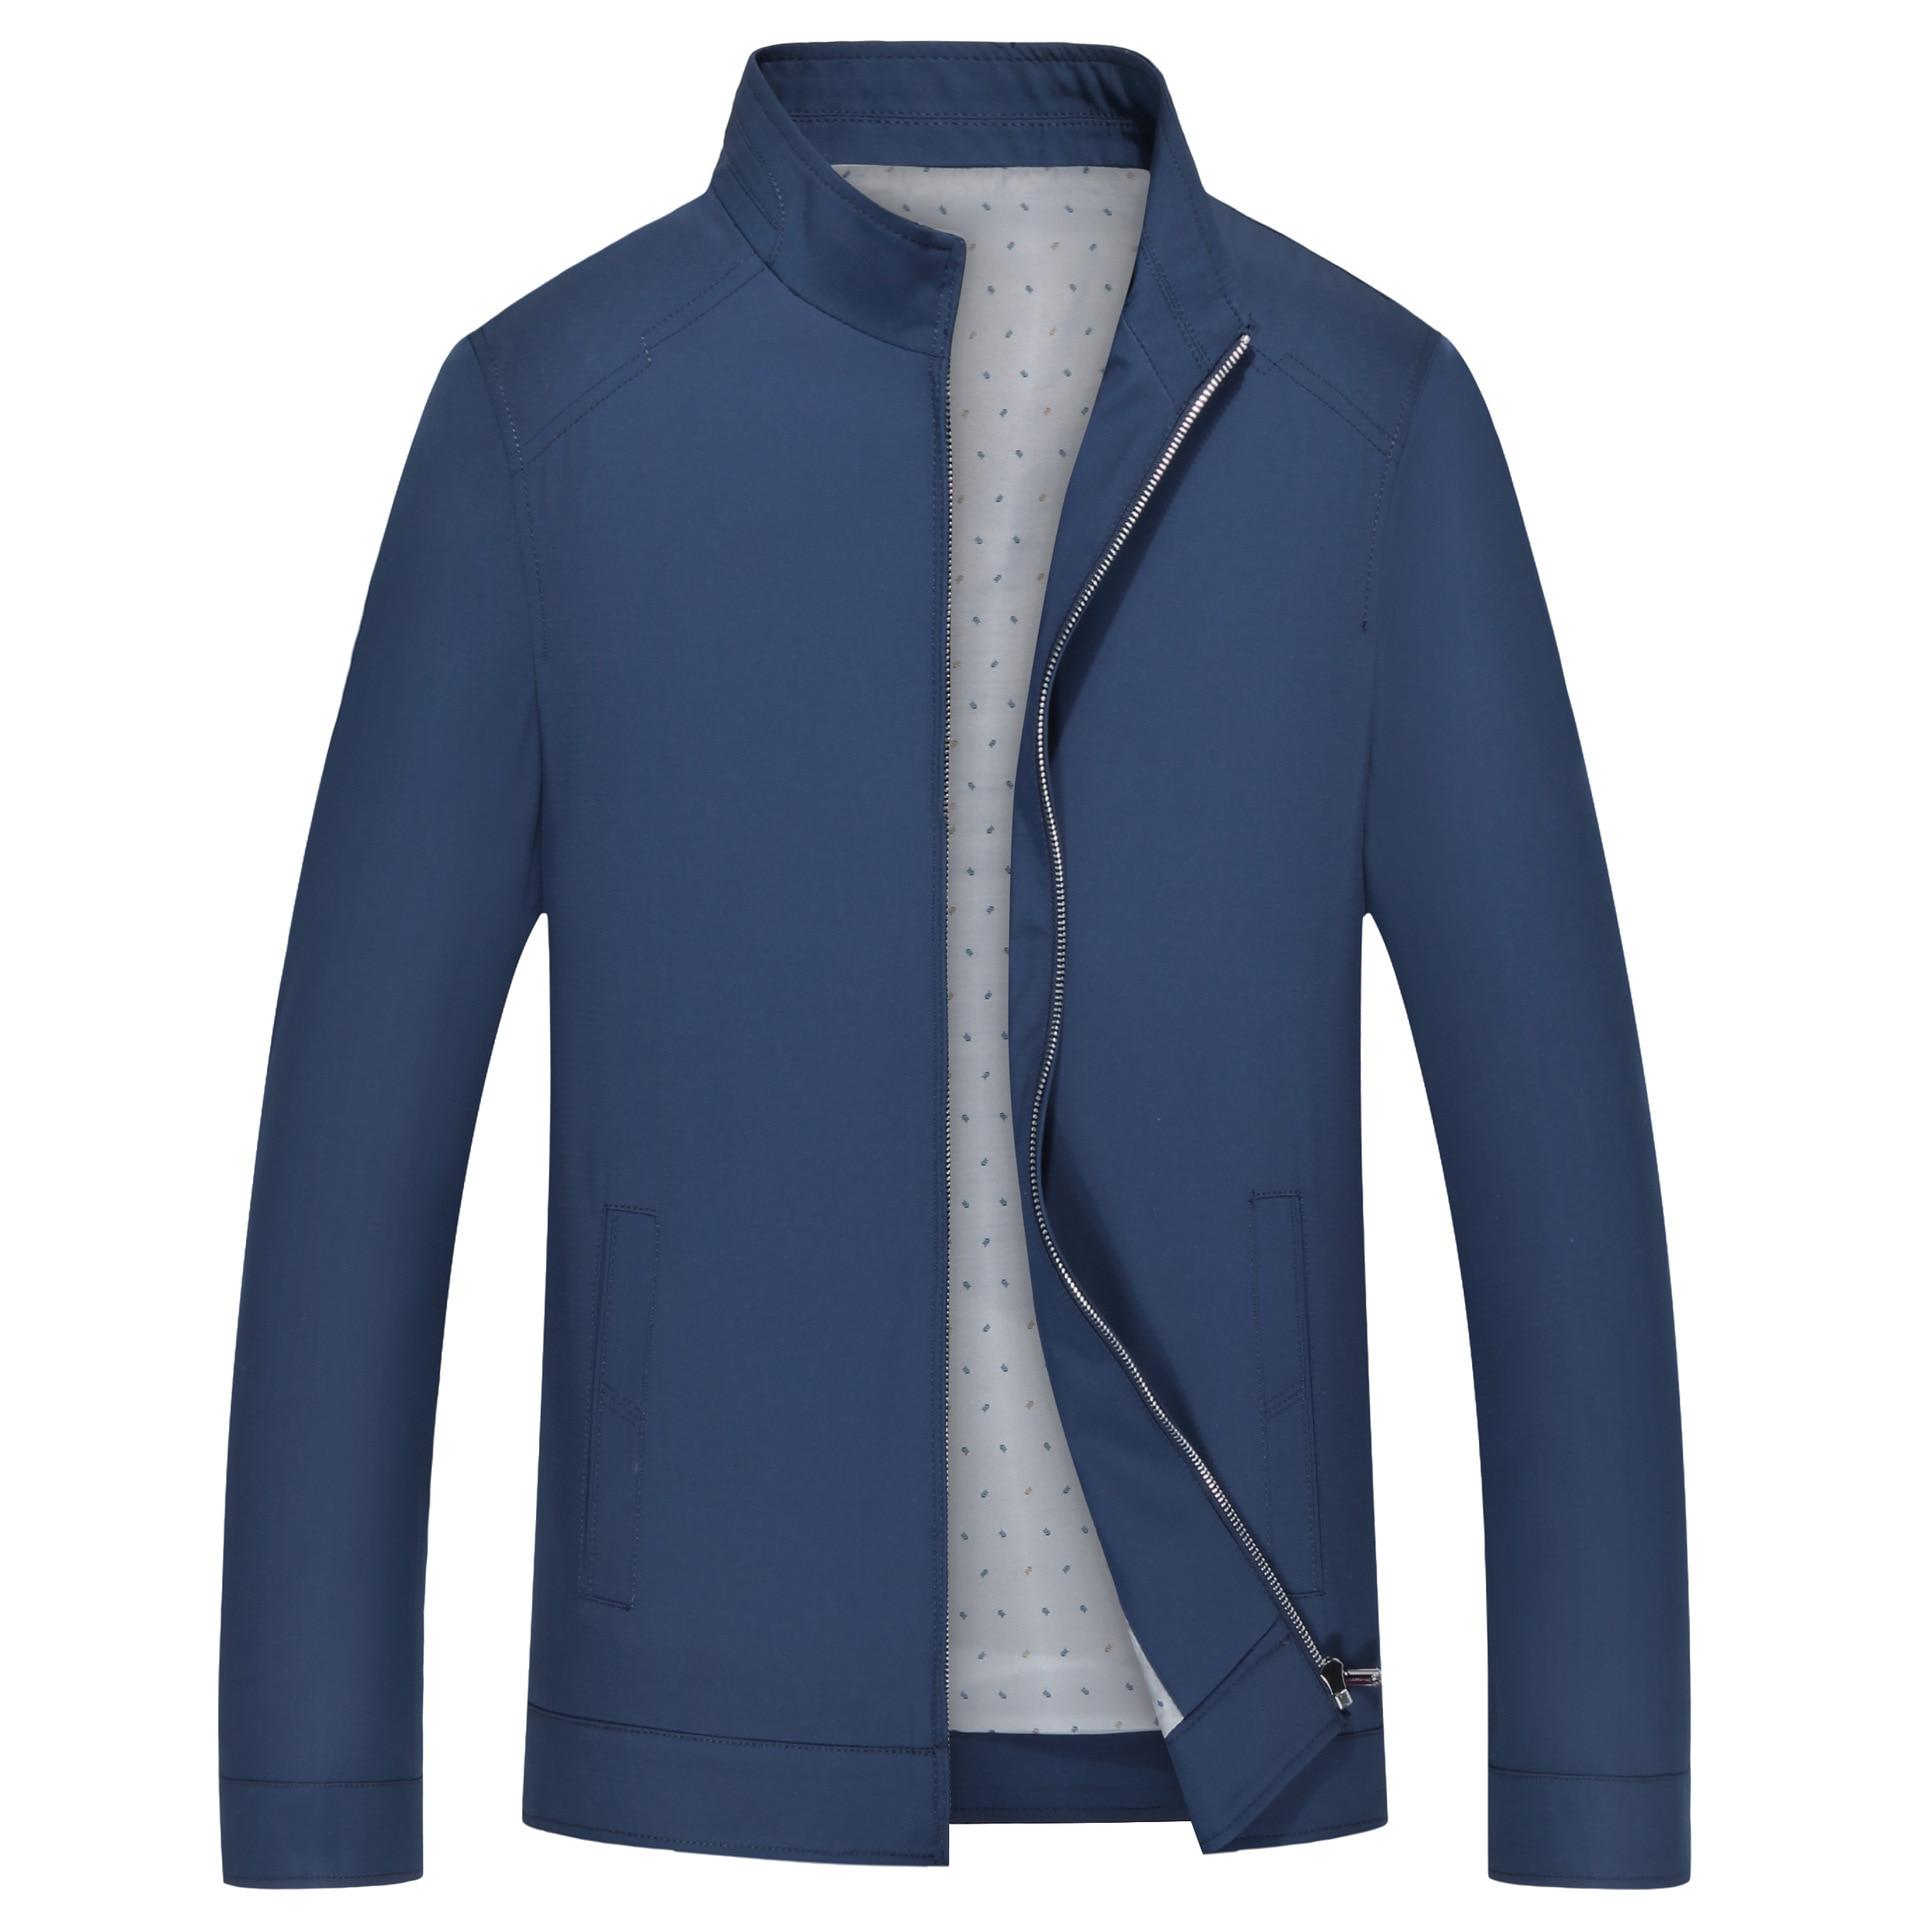 Mens spring jackets fashion